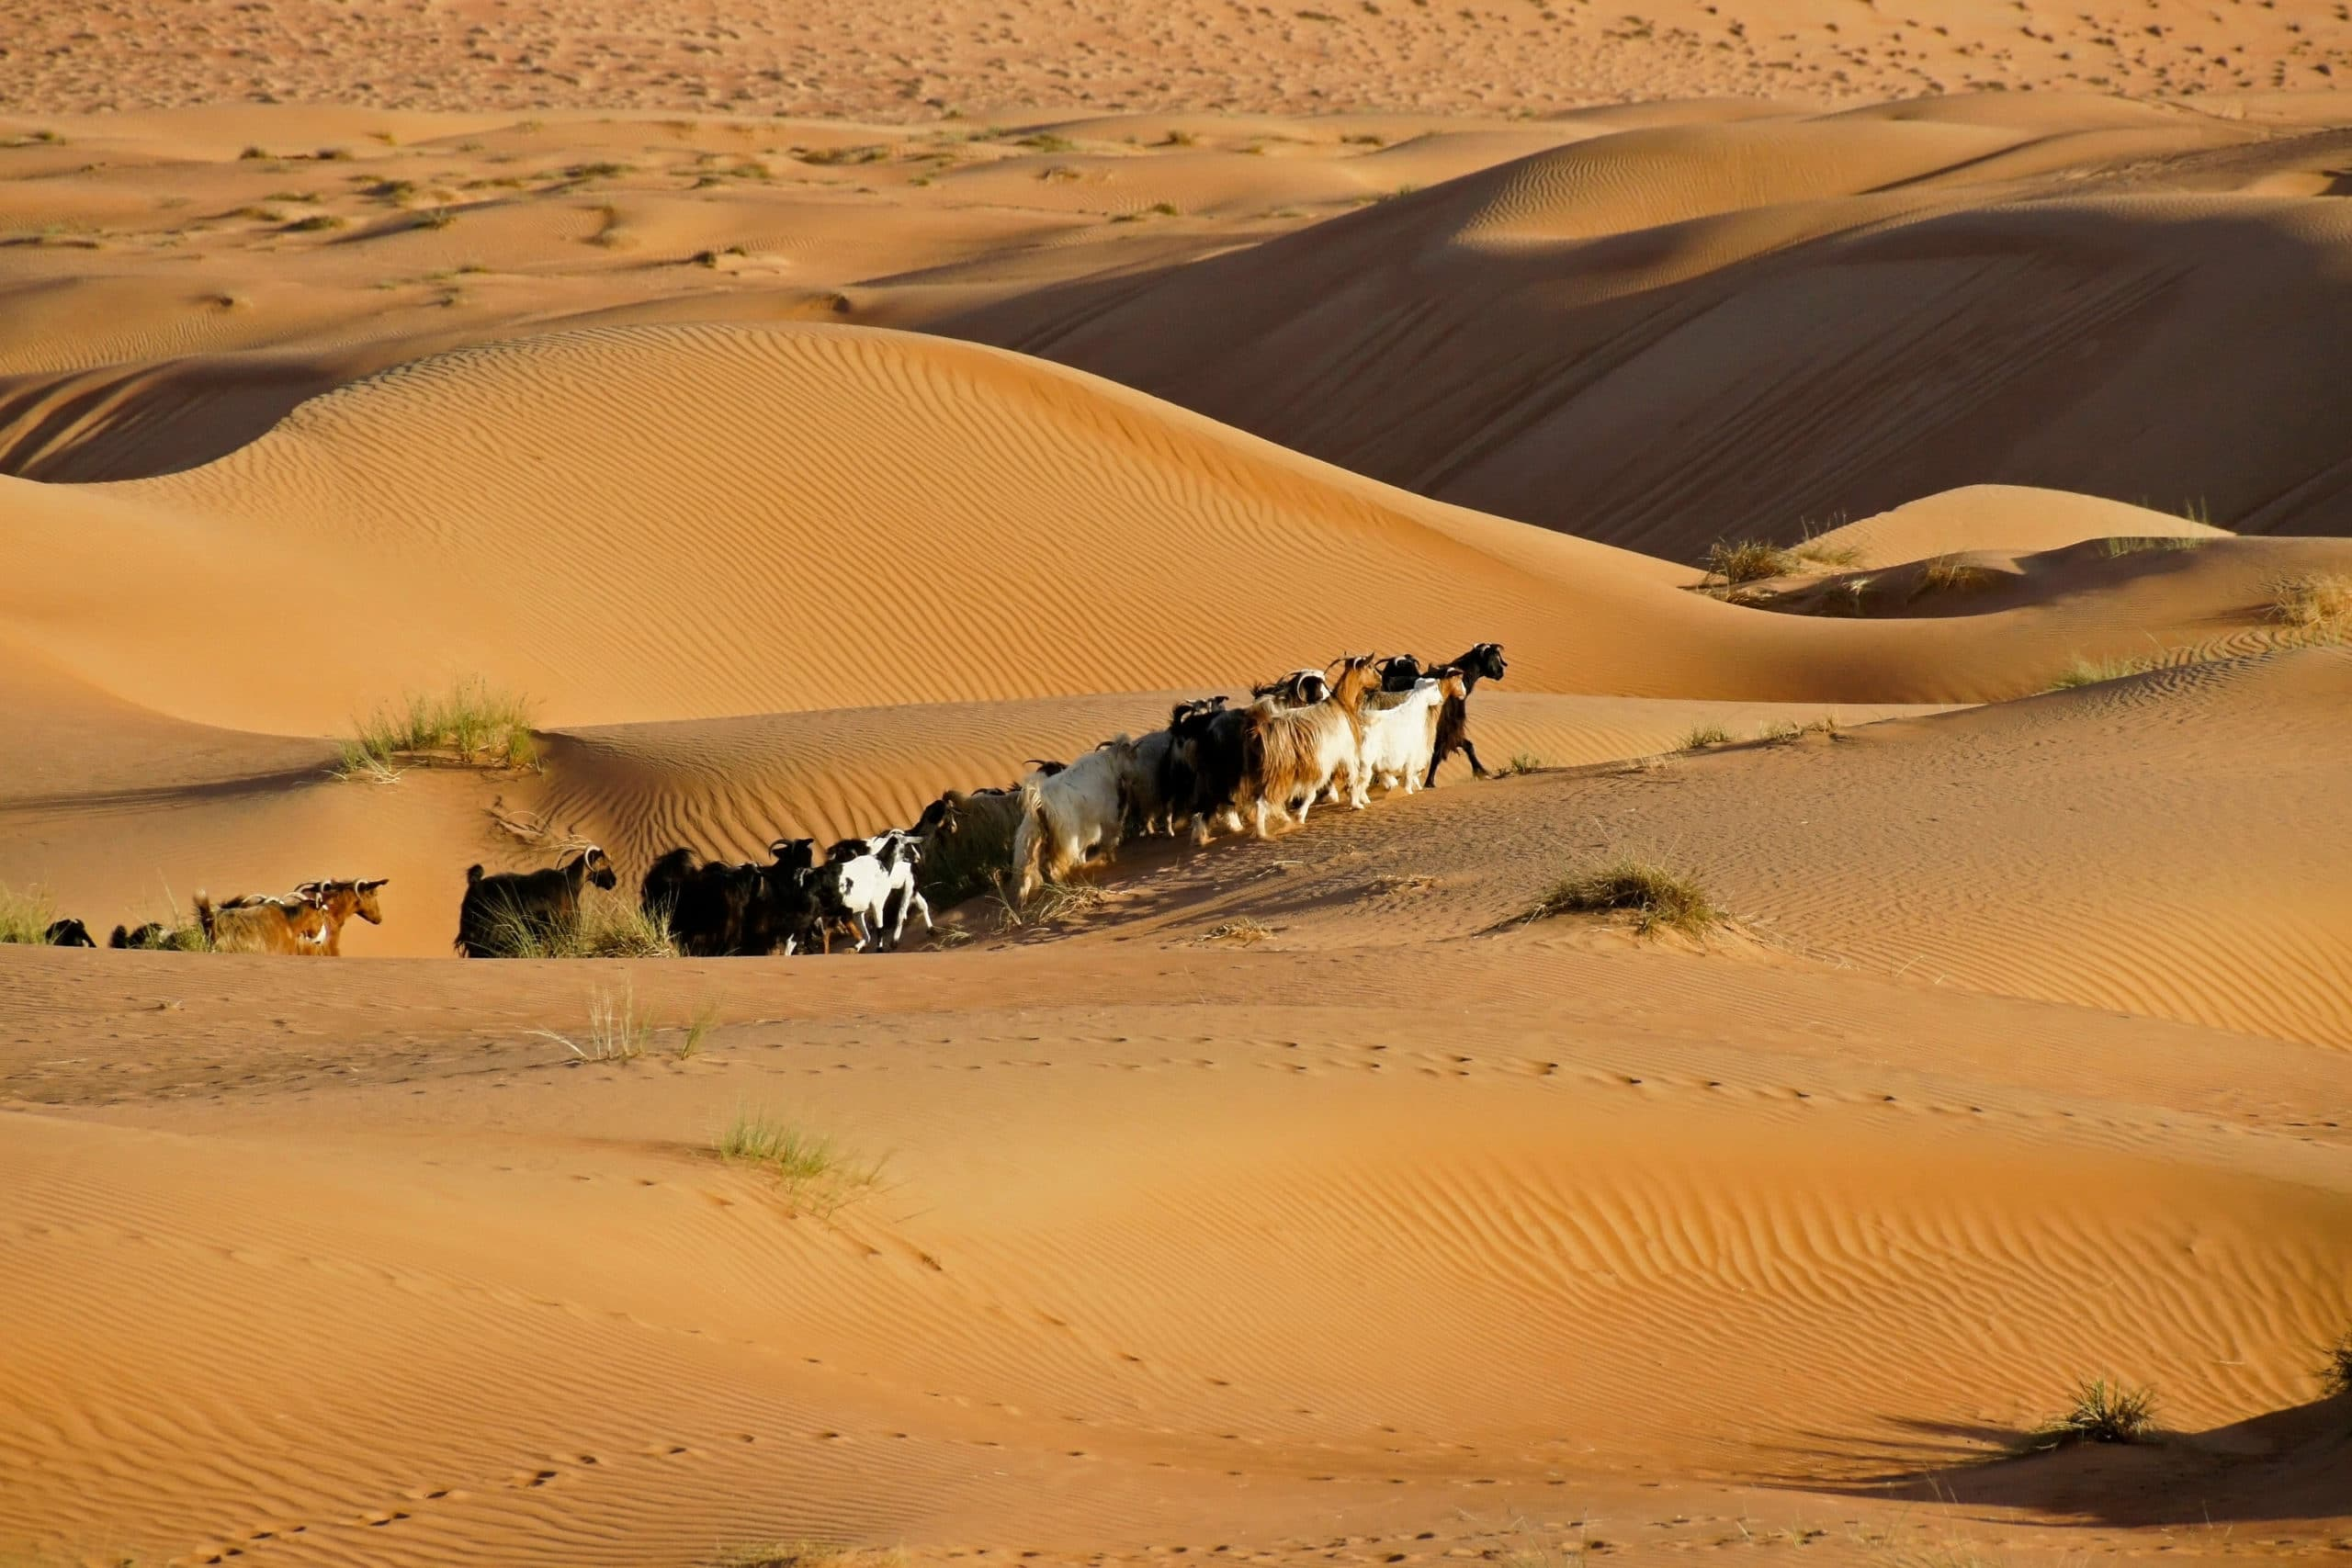 Wahiba Sands & Eastern Oman - Luxury Tour of Oman